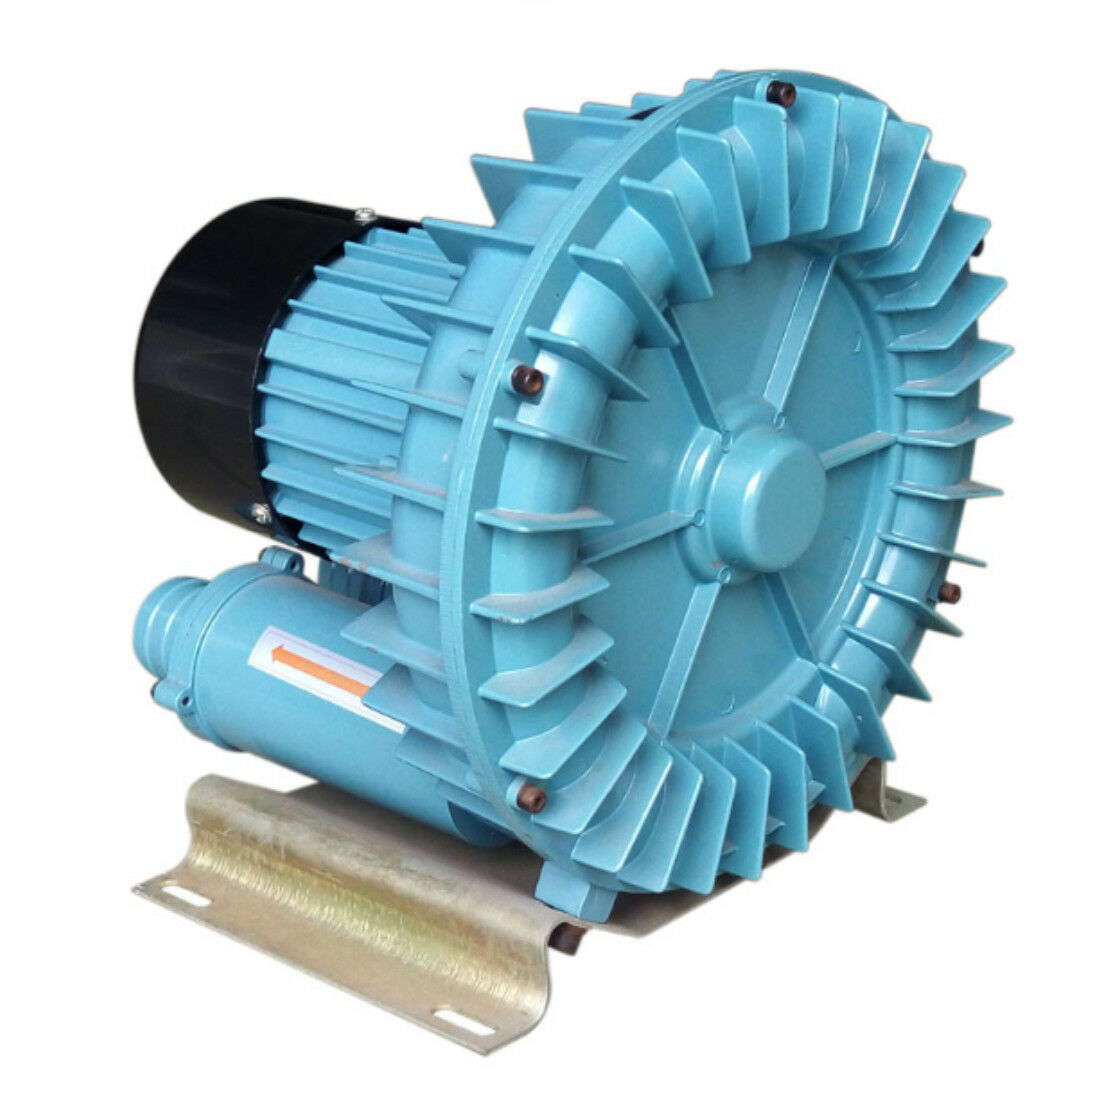 Resun Blower Air Pump GF750 Water Pumps Feature For Fish Tanks Aquariums Ponds